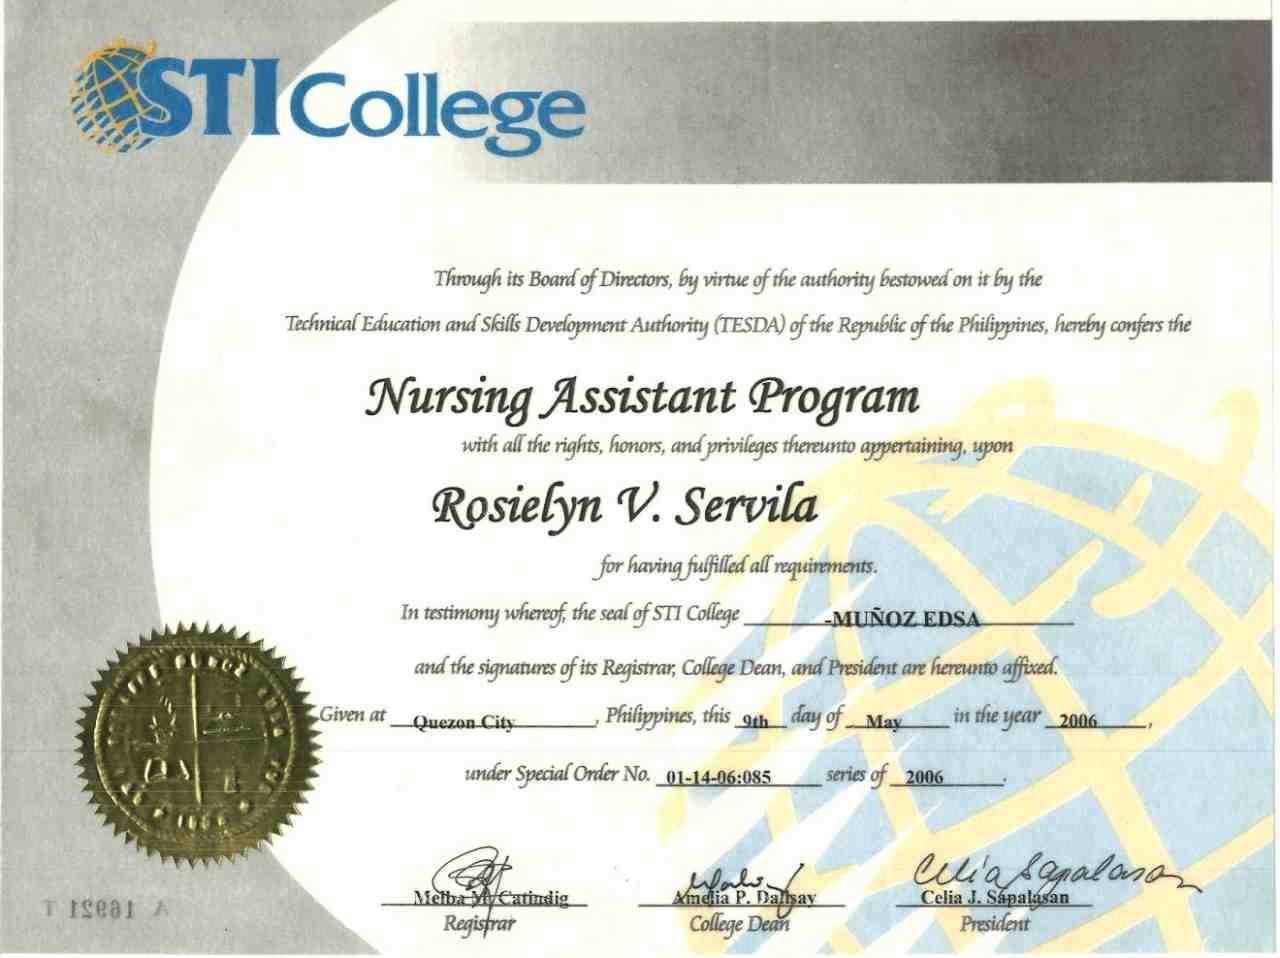 Rosielyn vequiso servila bayt diploma nursing assistant program yelopaper Images